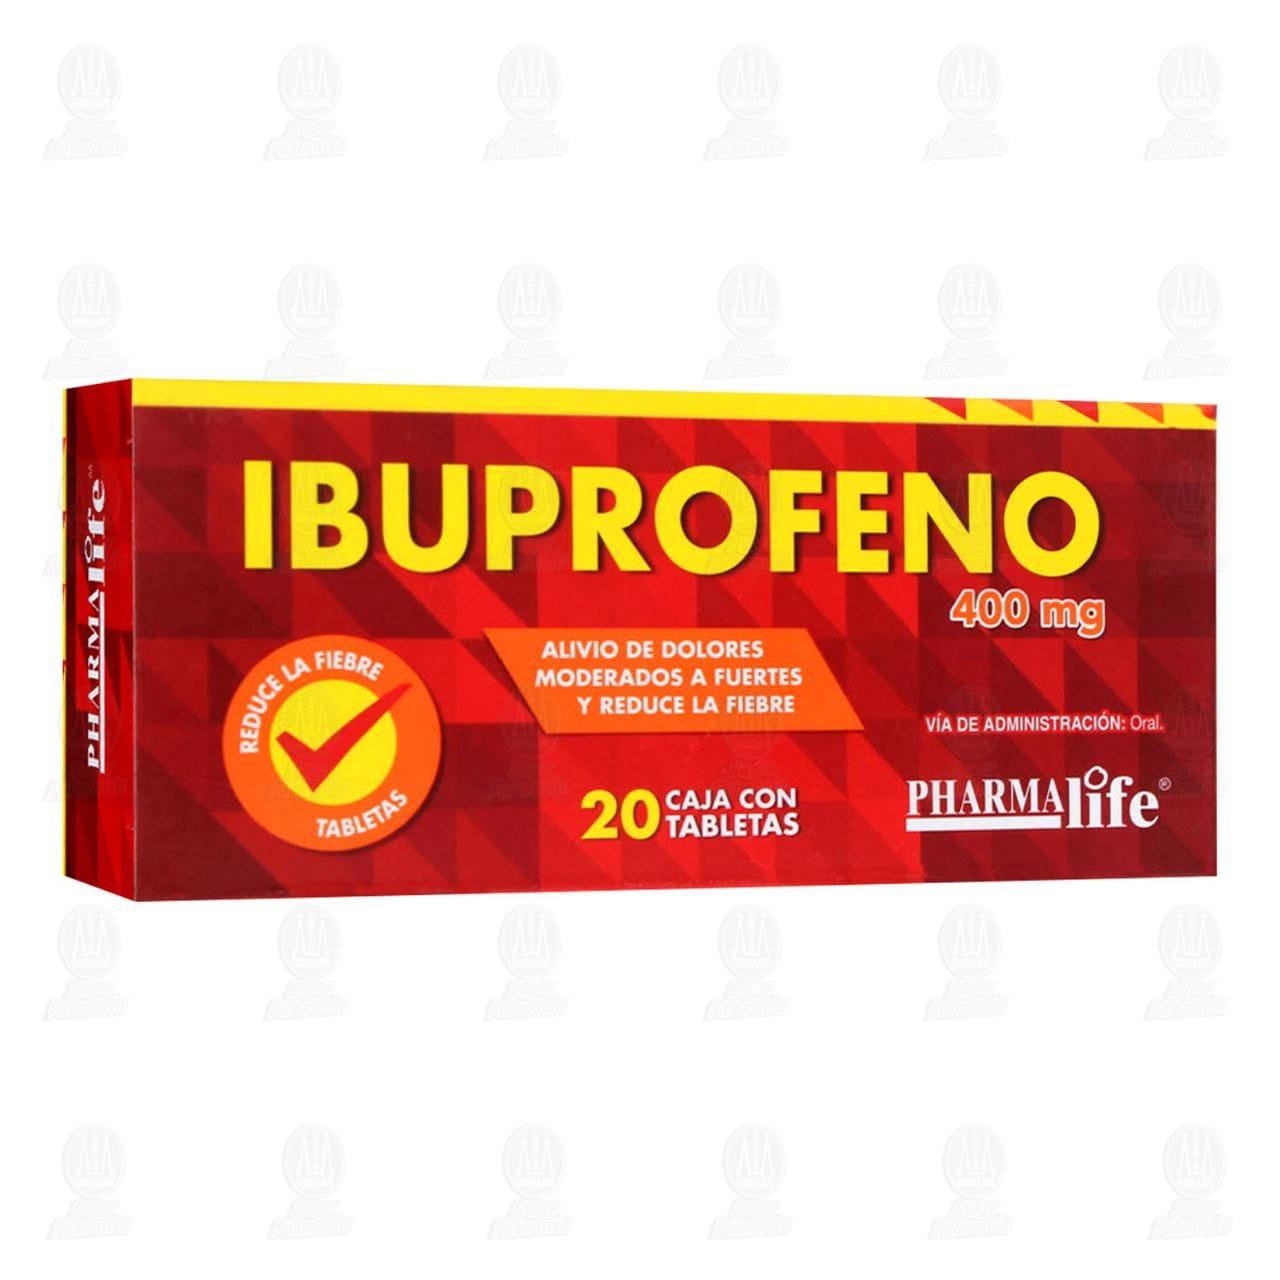 Comprar Ibuprofeno 400mg 20 Tabletas Pharmalife en Farmacias Guadalajara